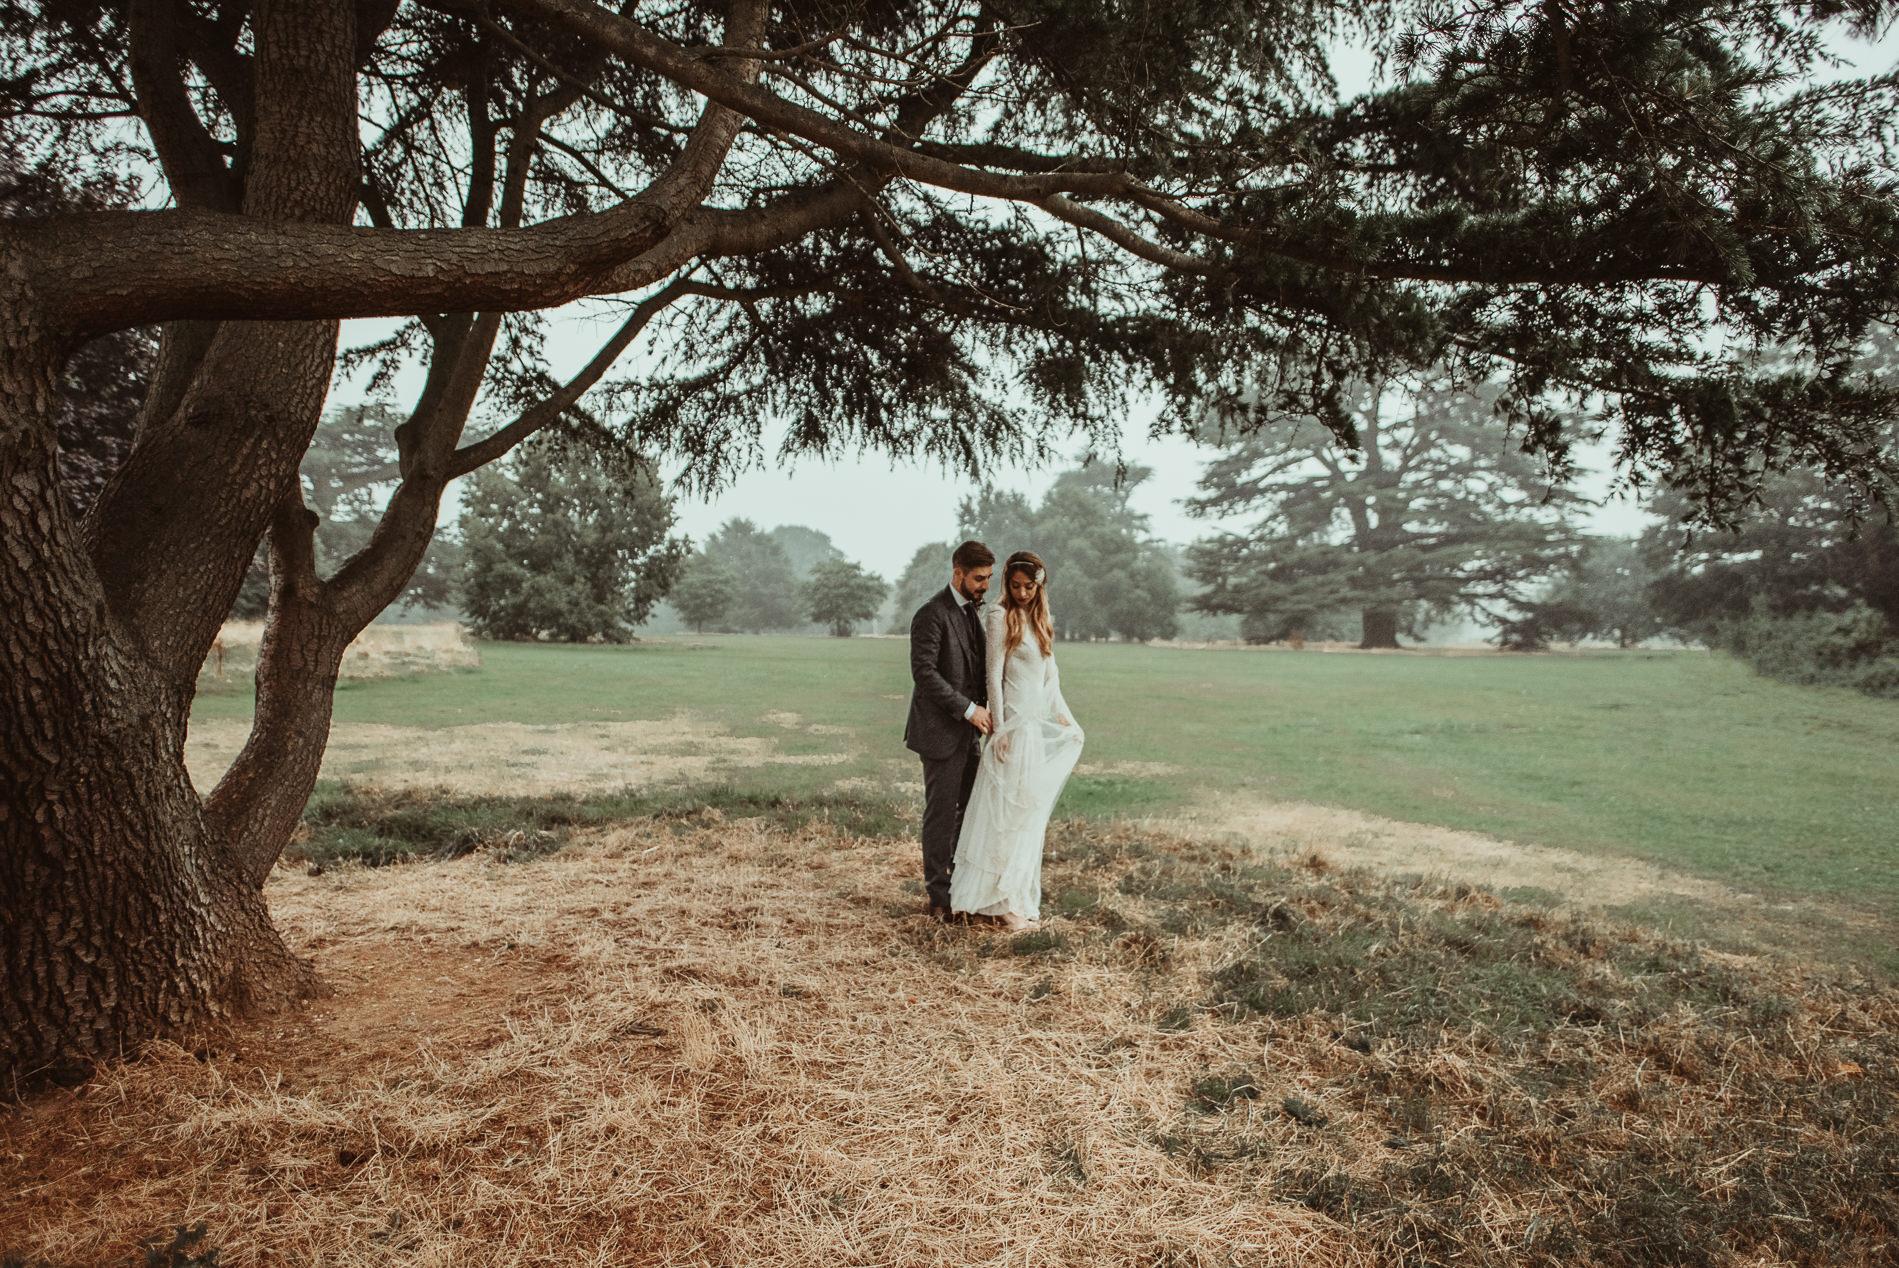 bohemian_wedding_lawshall_church_garden80